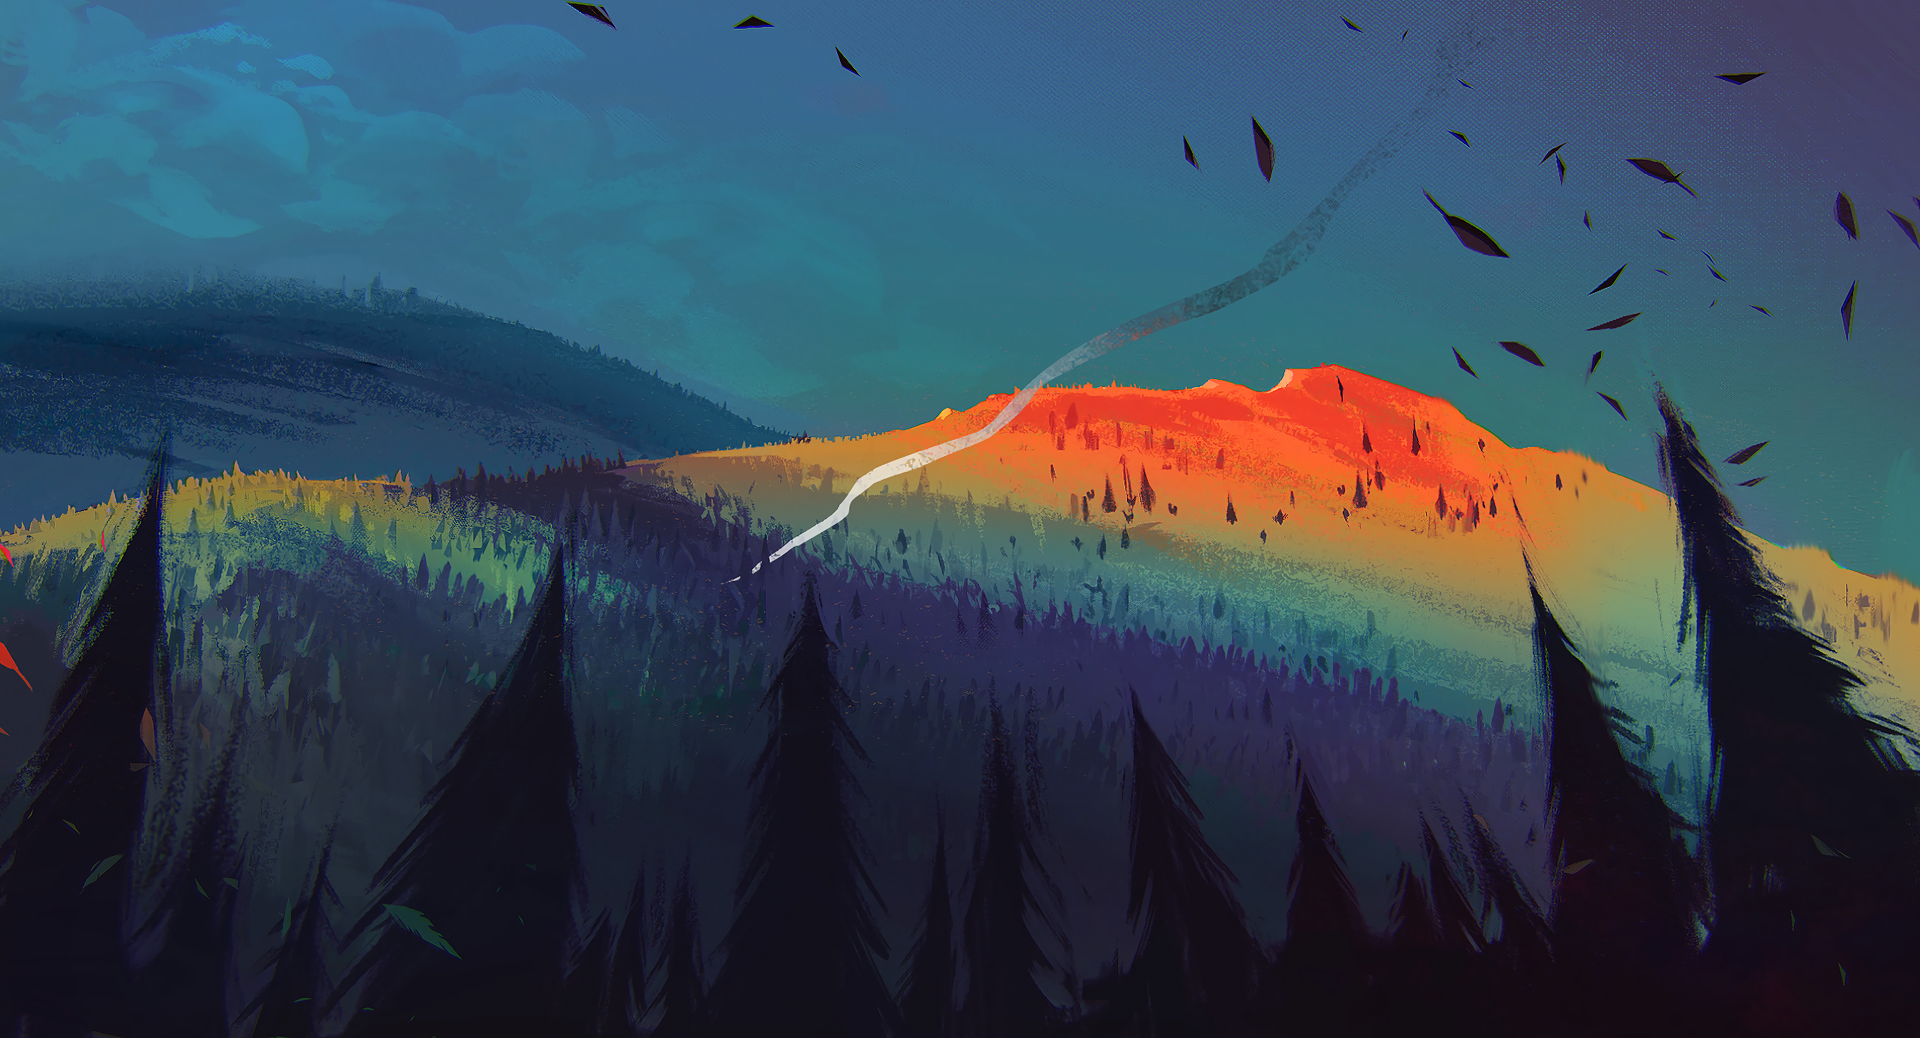 General 1920x1038 mountains trees smoke leaves artwork digital art forest